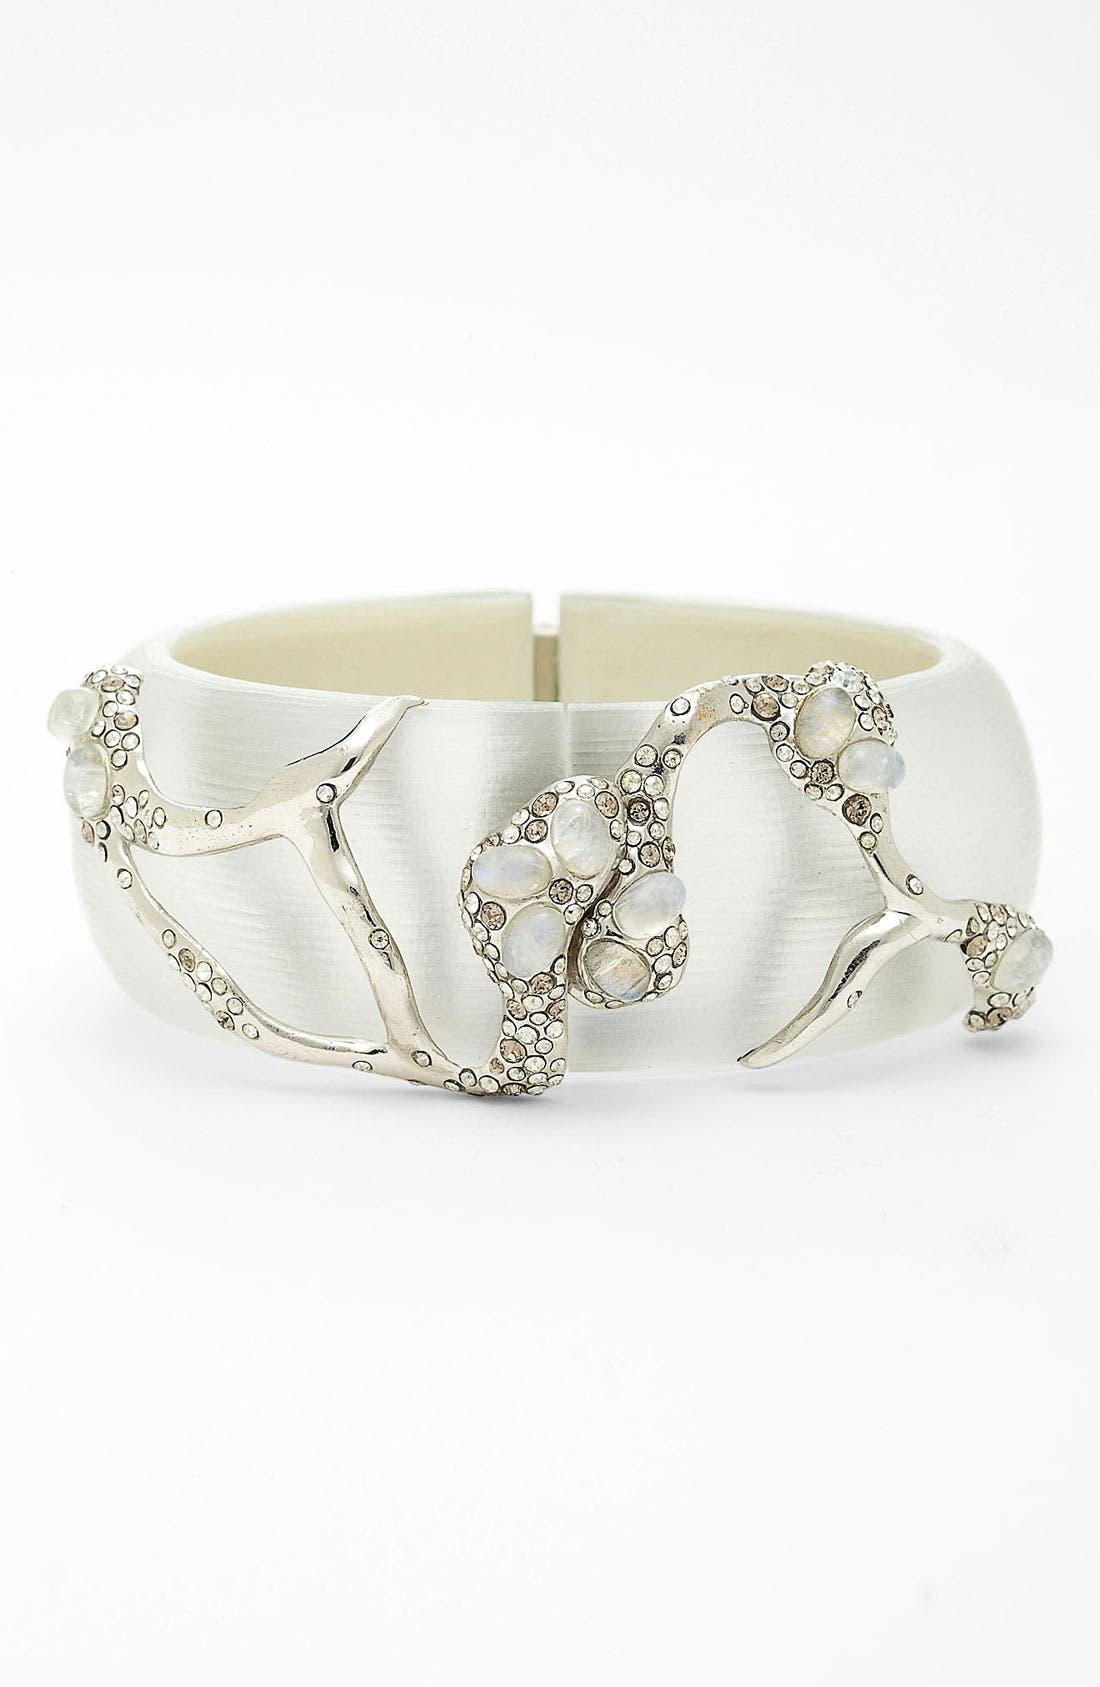 Alternate Image 1 Selected - Alexis Bittar 'Modernist - Embraced' Hinged Bracelet (Nordstrom Exclusive)